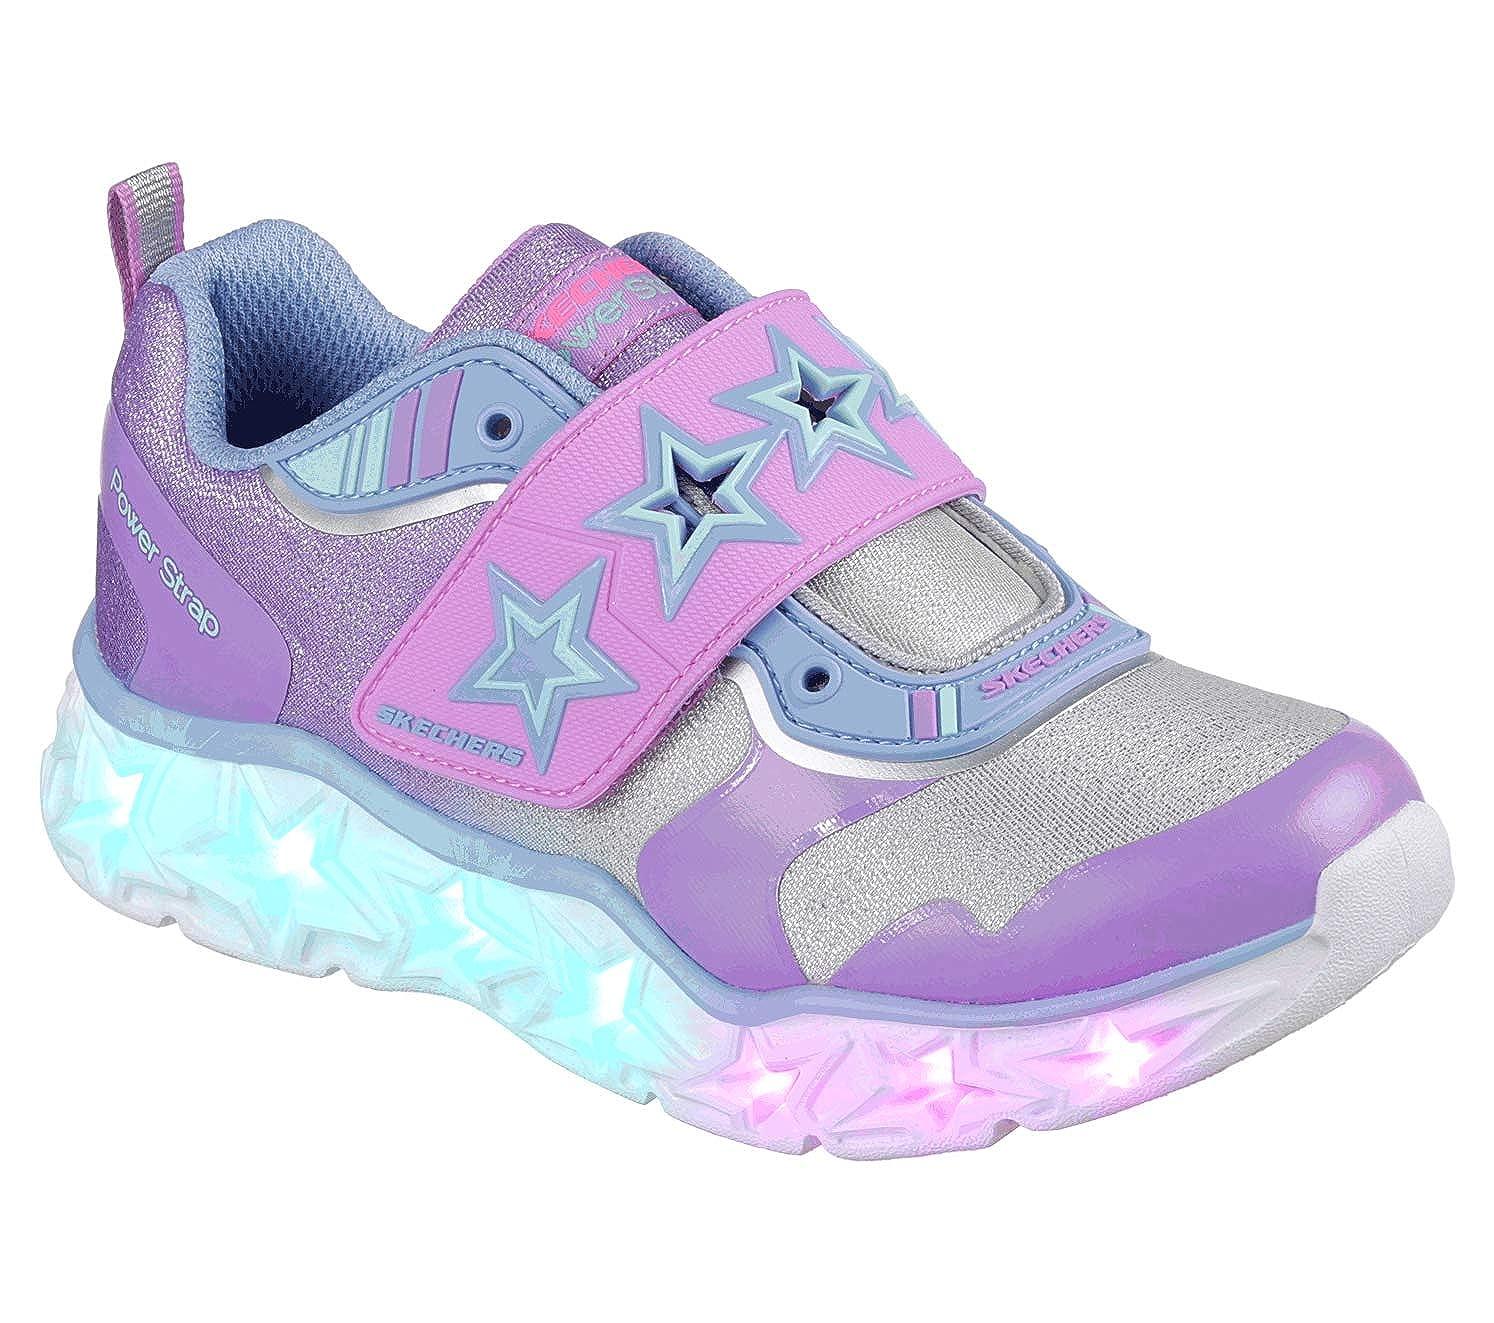 Skechers Kids Girls' Galaxy Lights